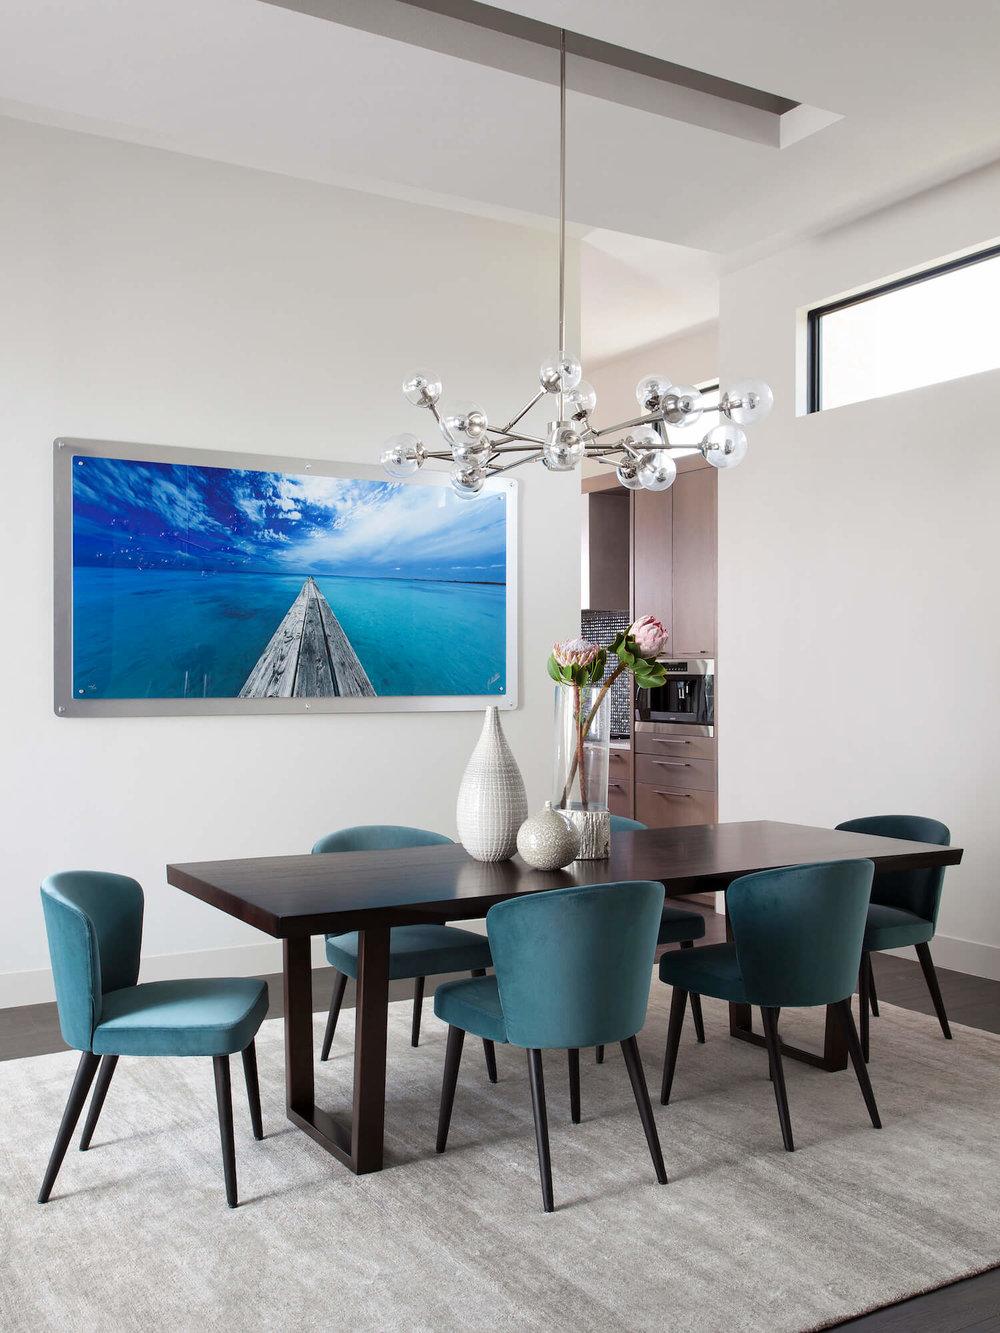 Horseshoe Bay Dining Room | Robin Colton Interior Design Studio Austin Texas | www.robincolton.com